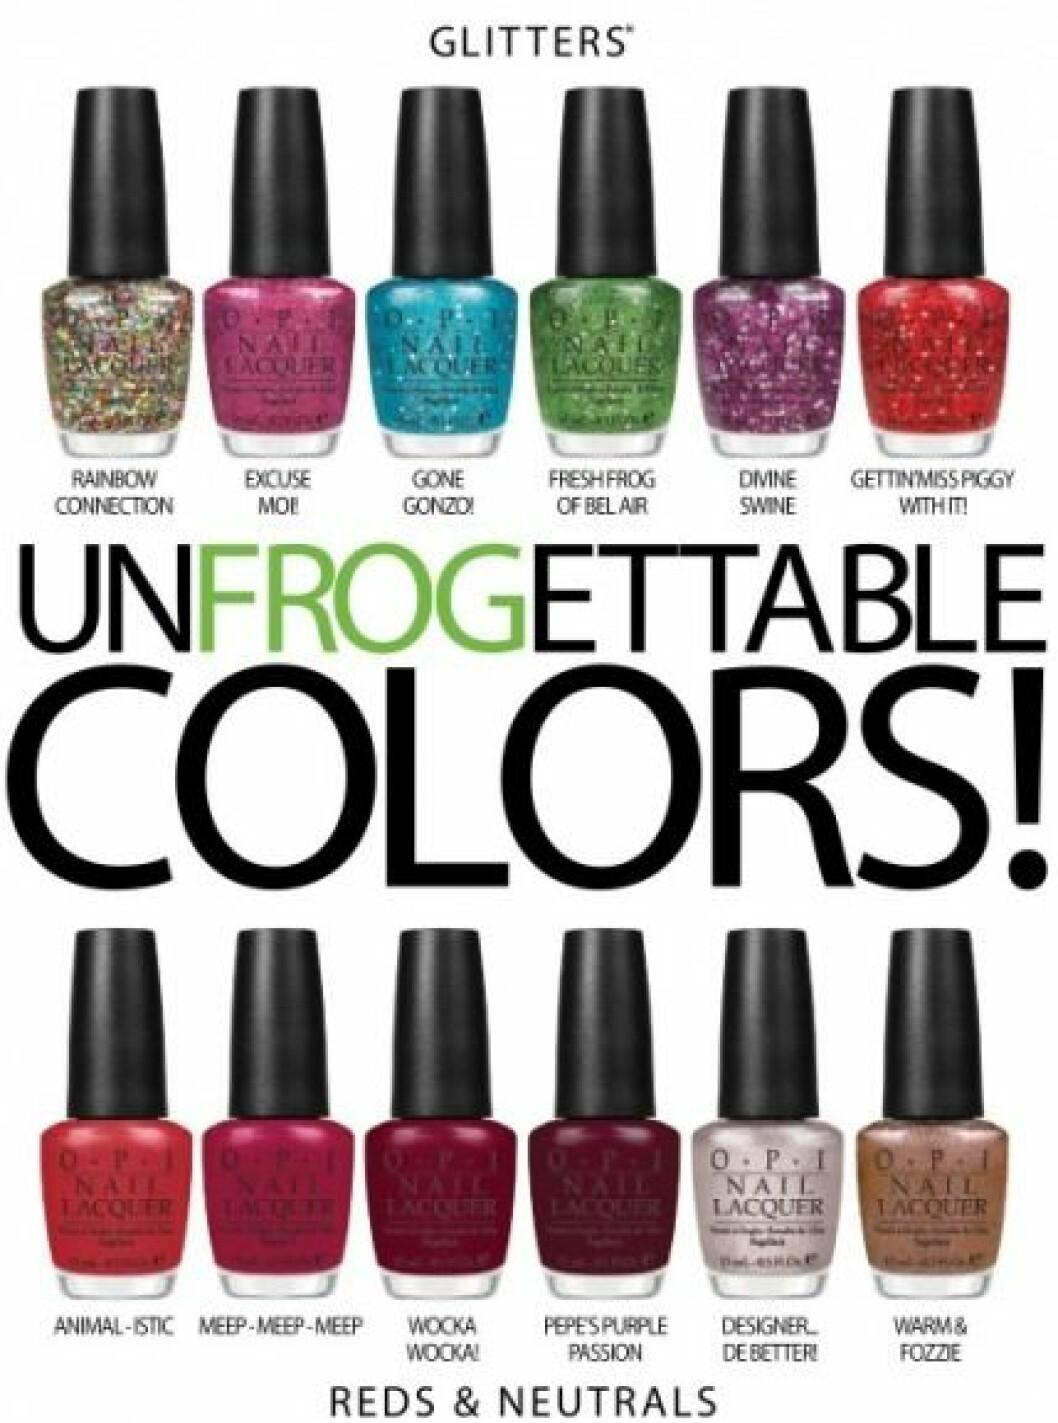 Unfrogettable colors från OPI och The Muppets.